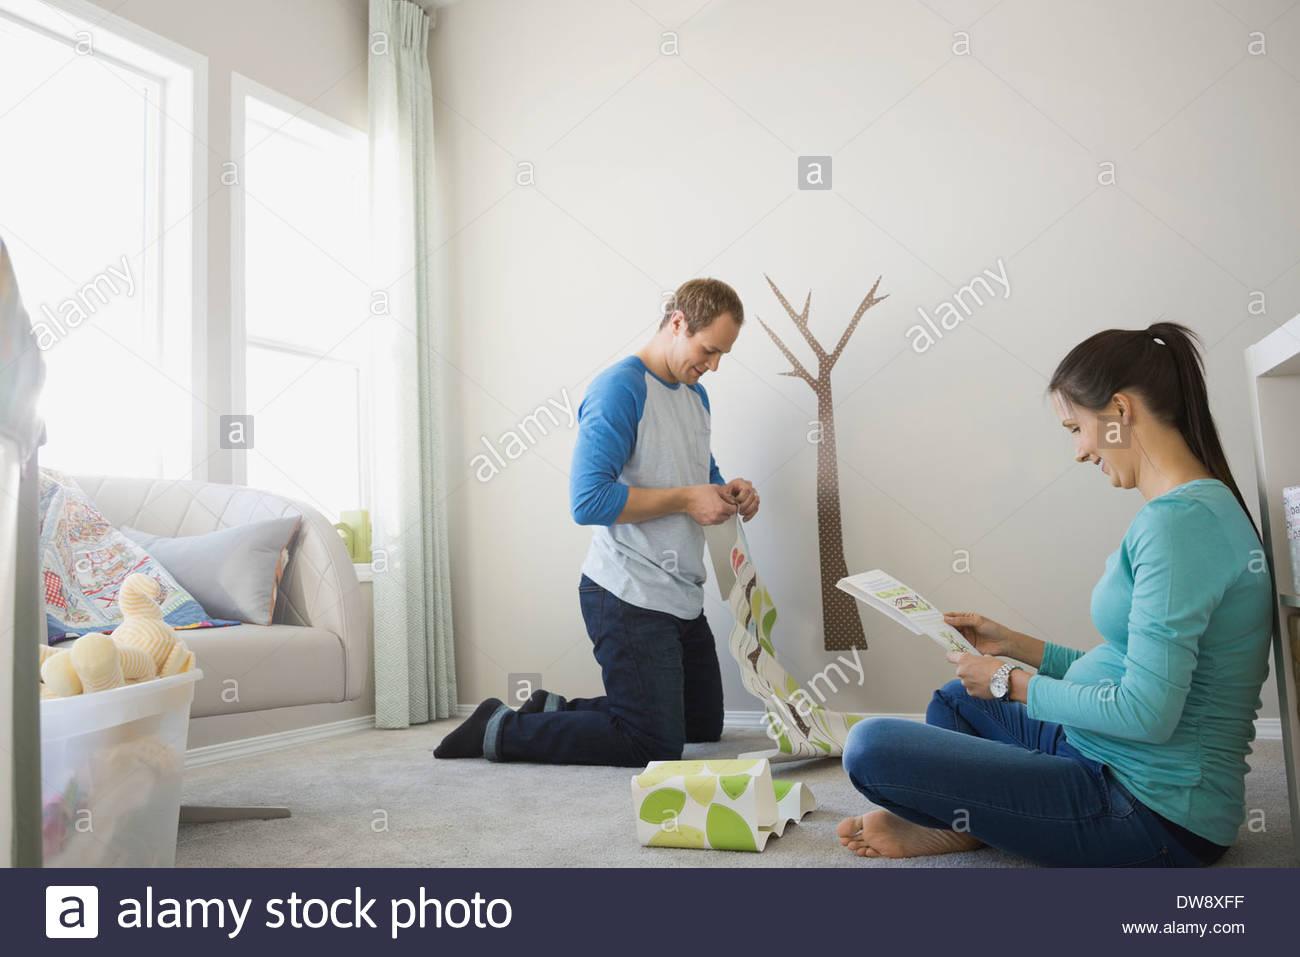 Expectant couple decorating nursery - Stock Image